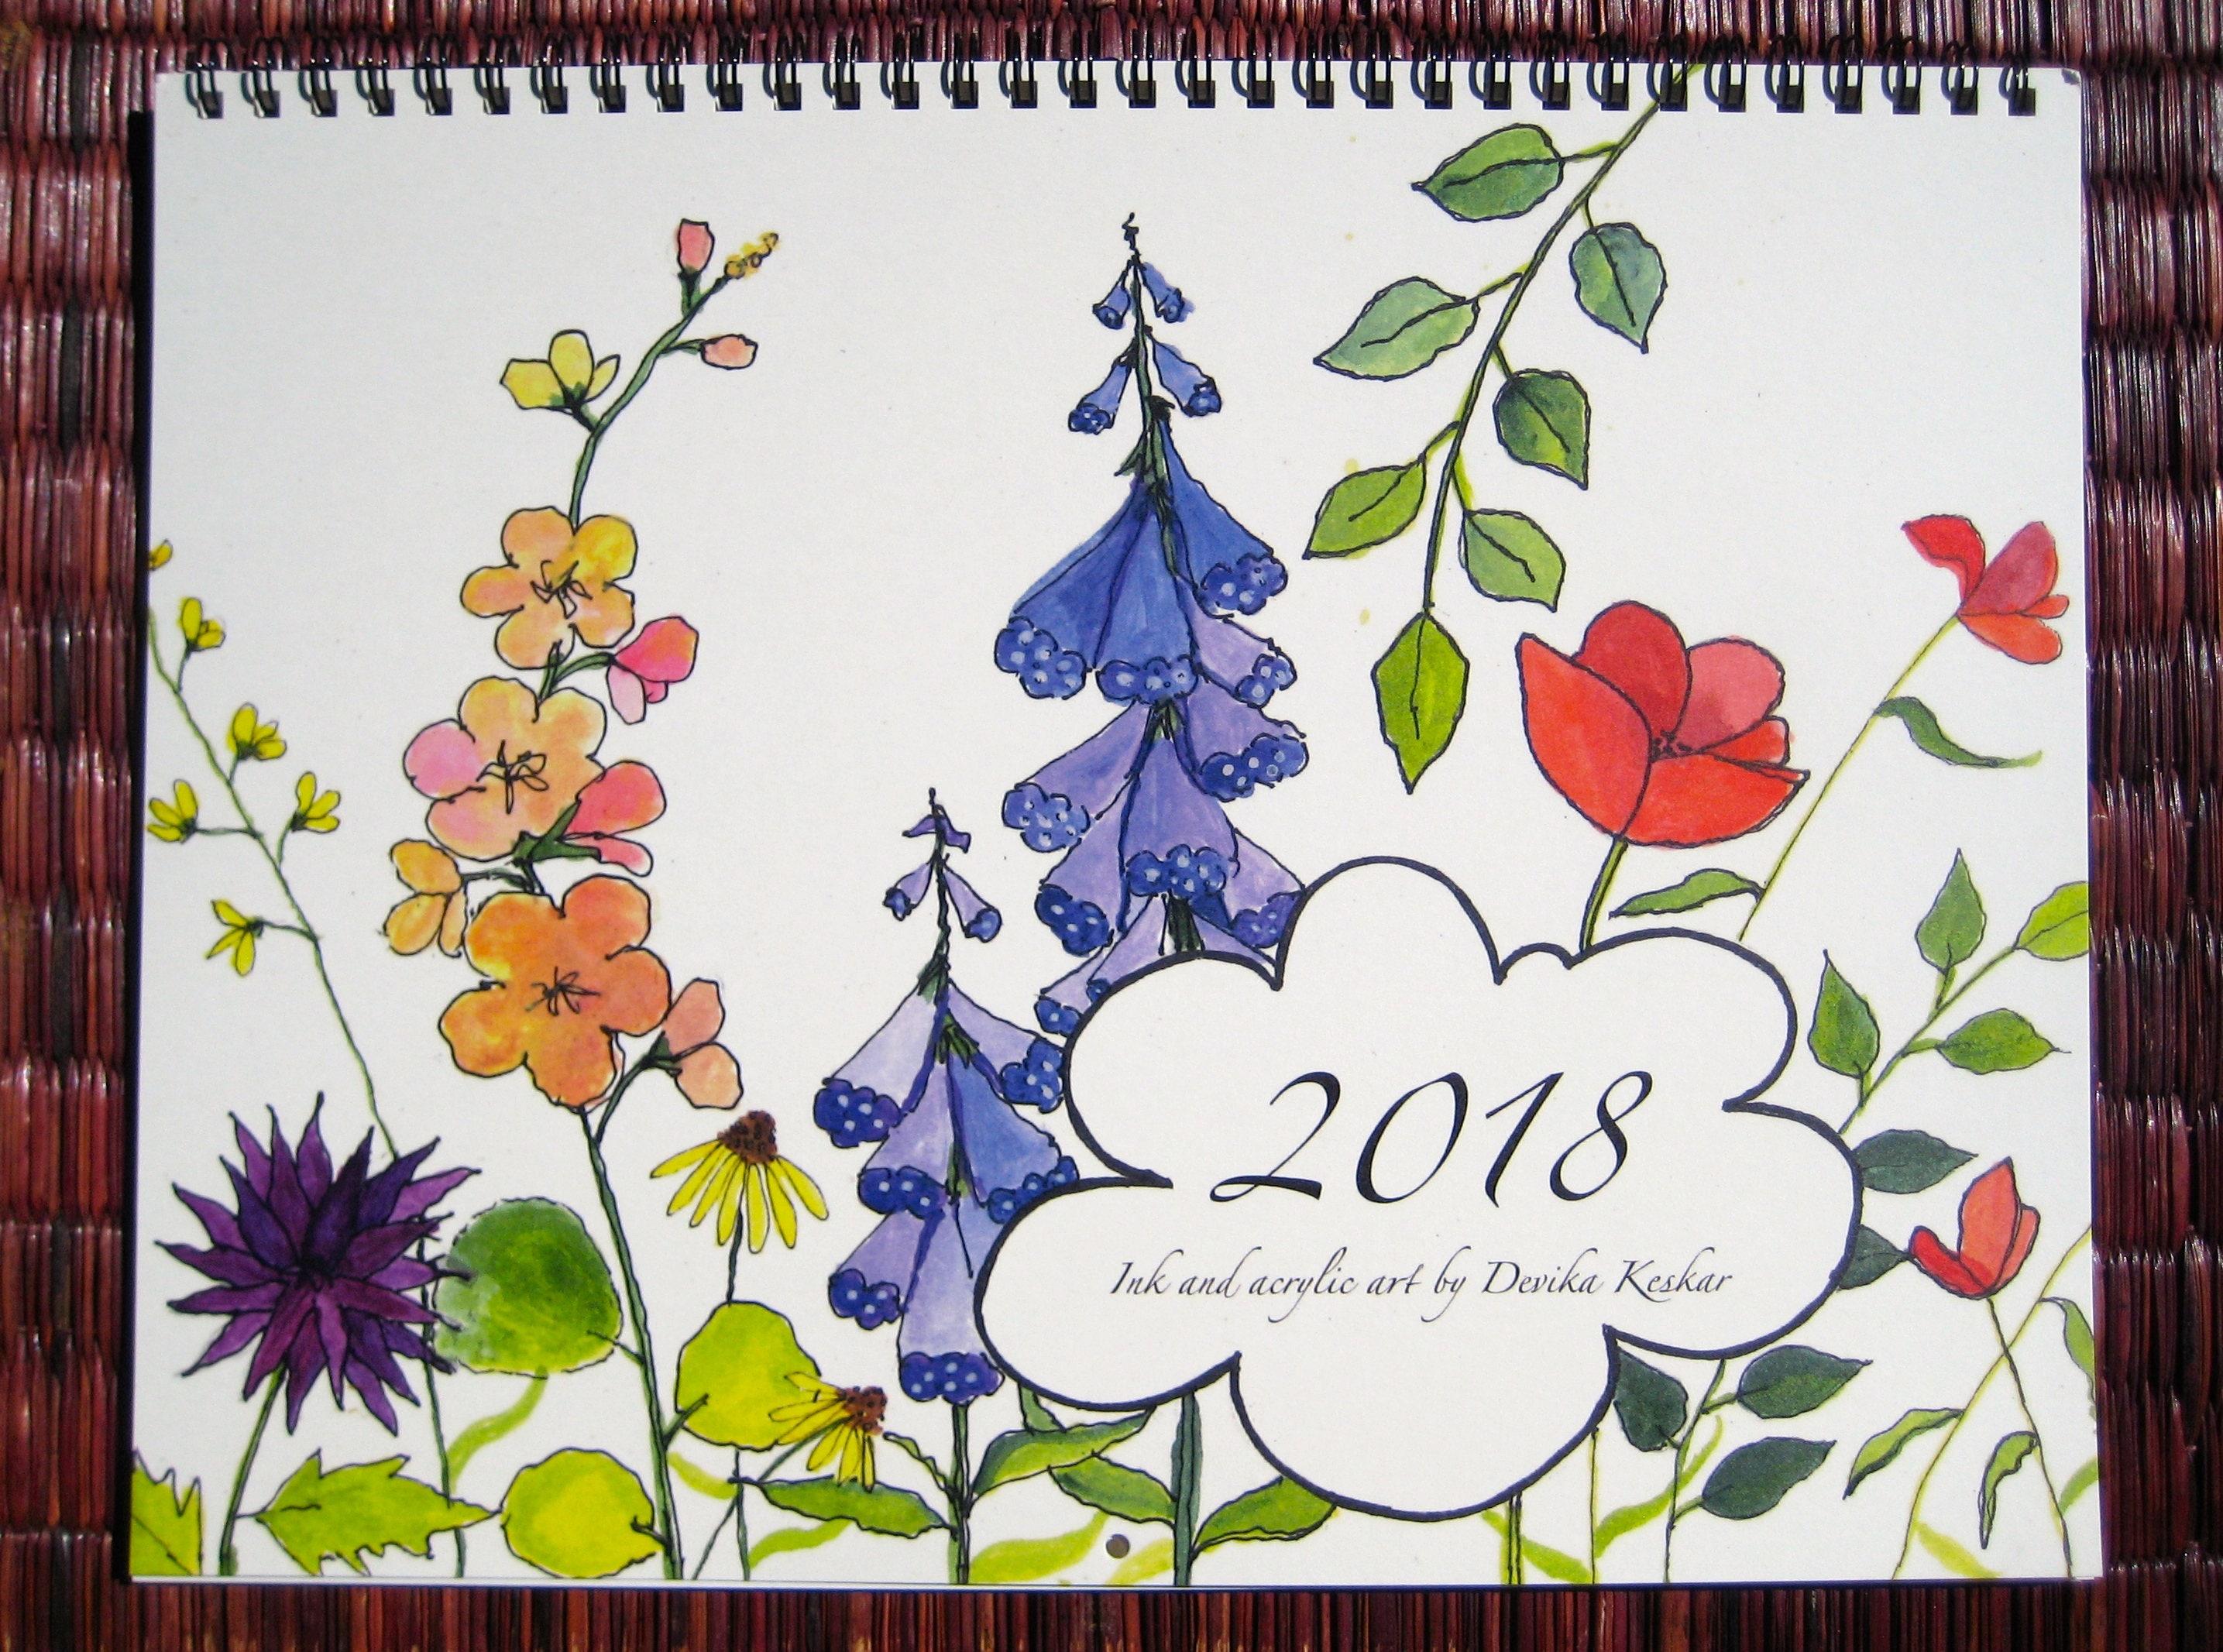 2018 WALL CALENDAR Floral calendar gift for her Christmas